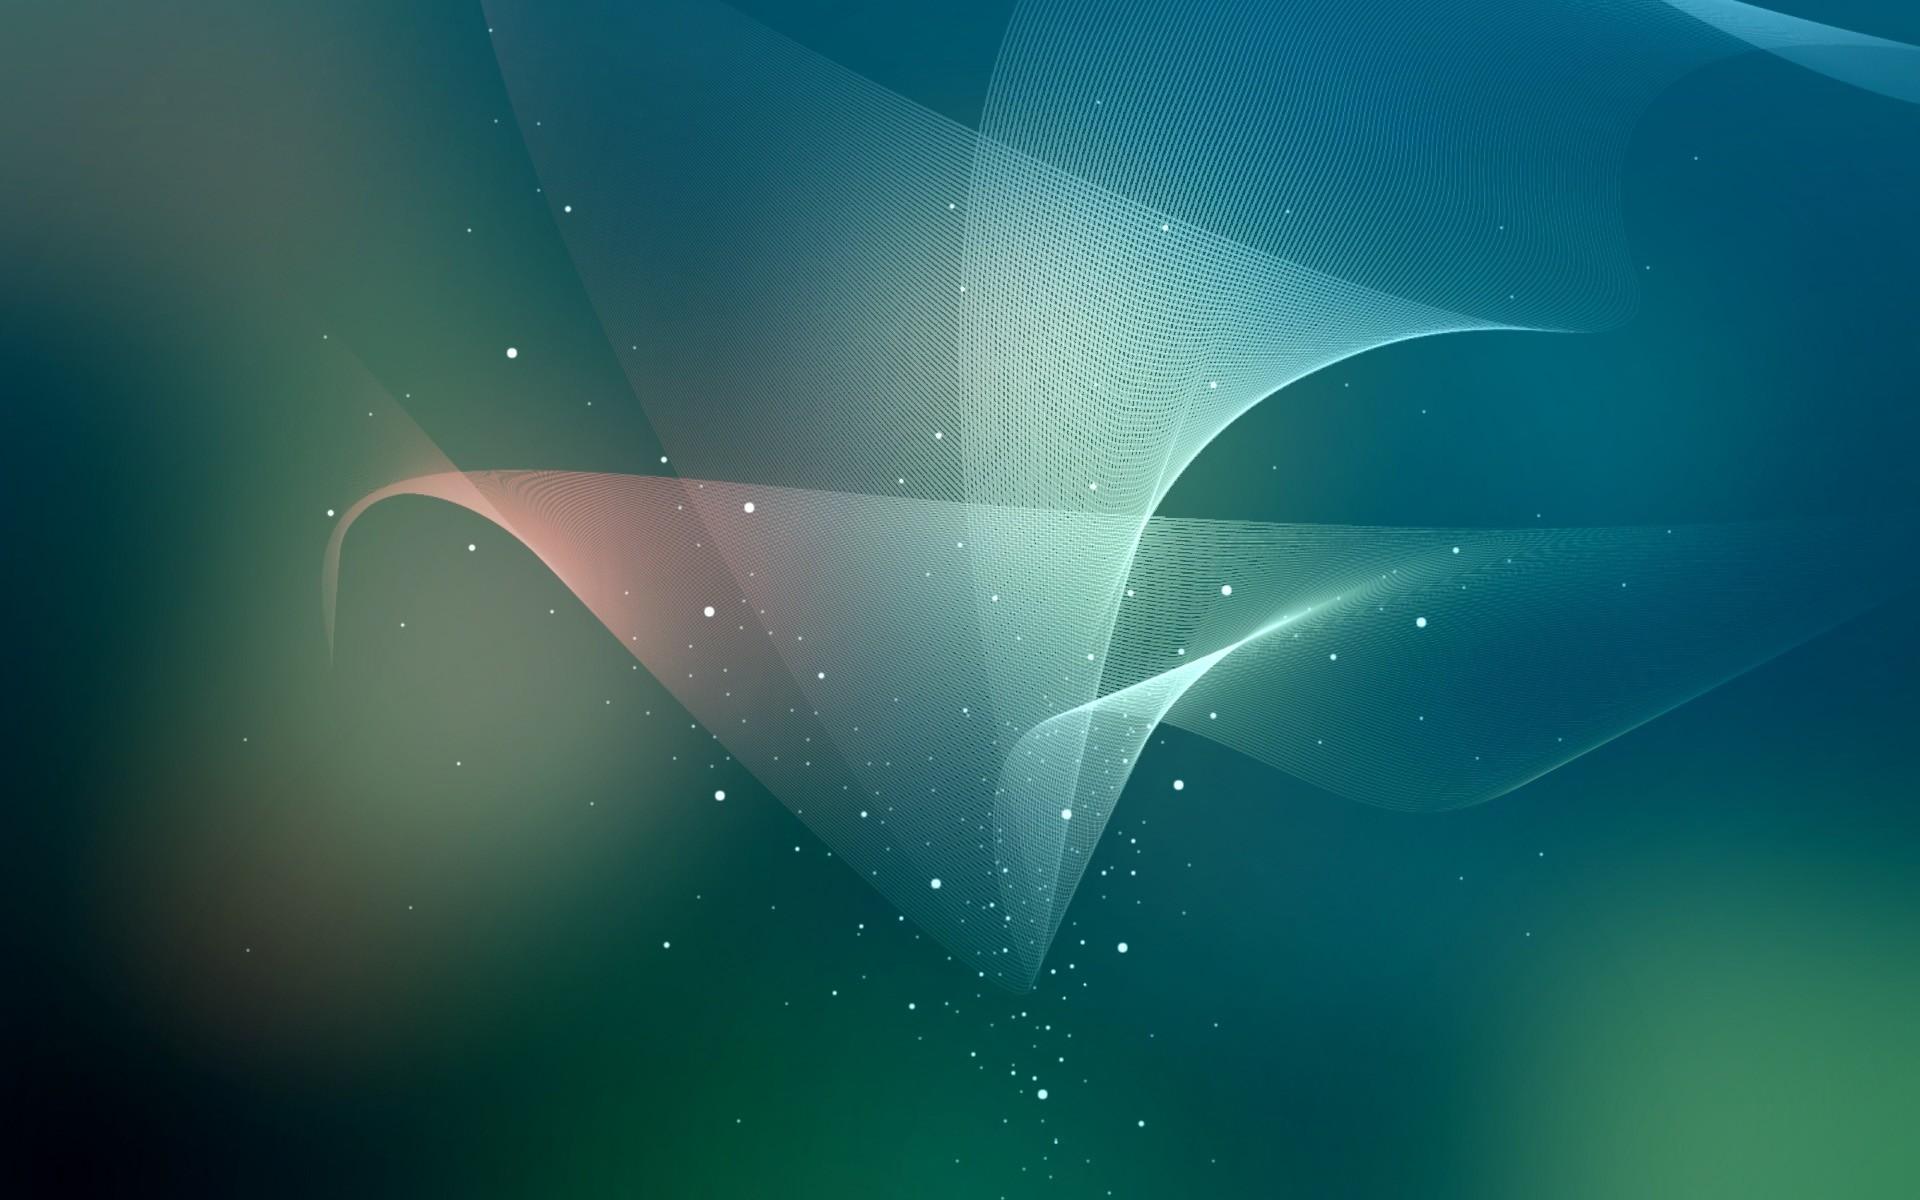 background wallpaper hd,blue,green,aqua,sky,water